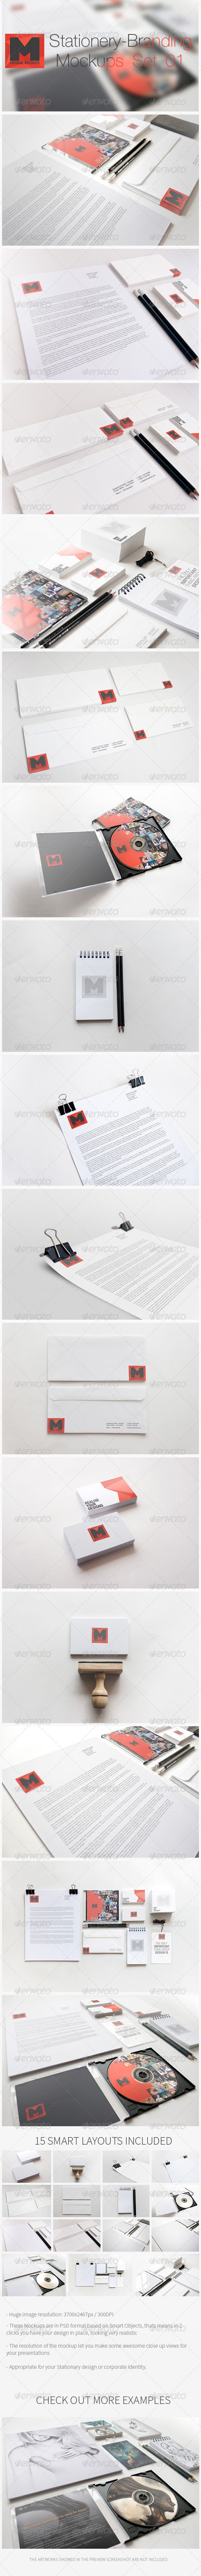 GraphicRiver Stationery Branding Mockups Set 01 4379740